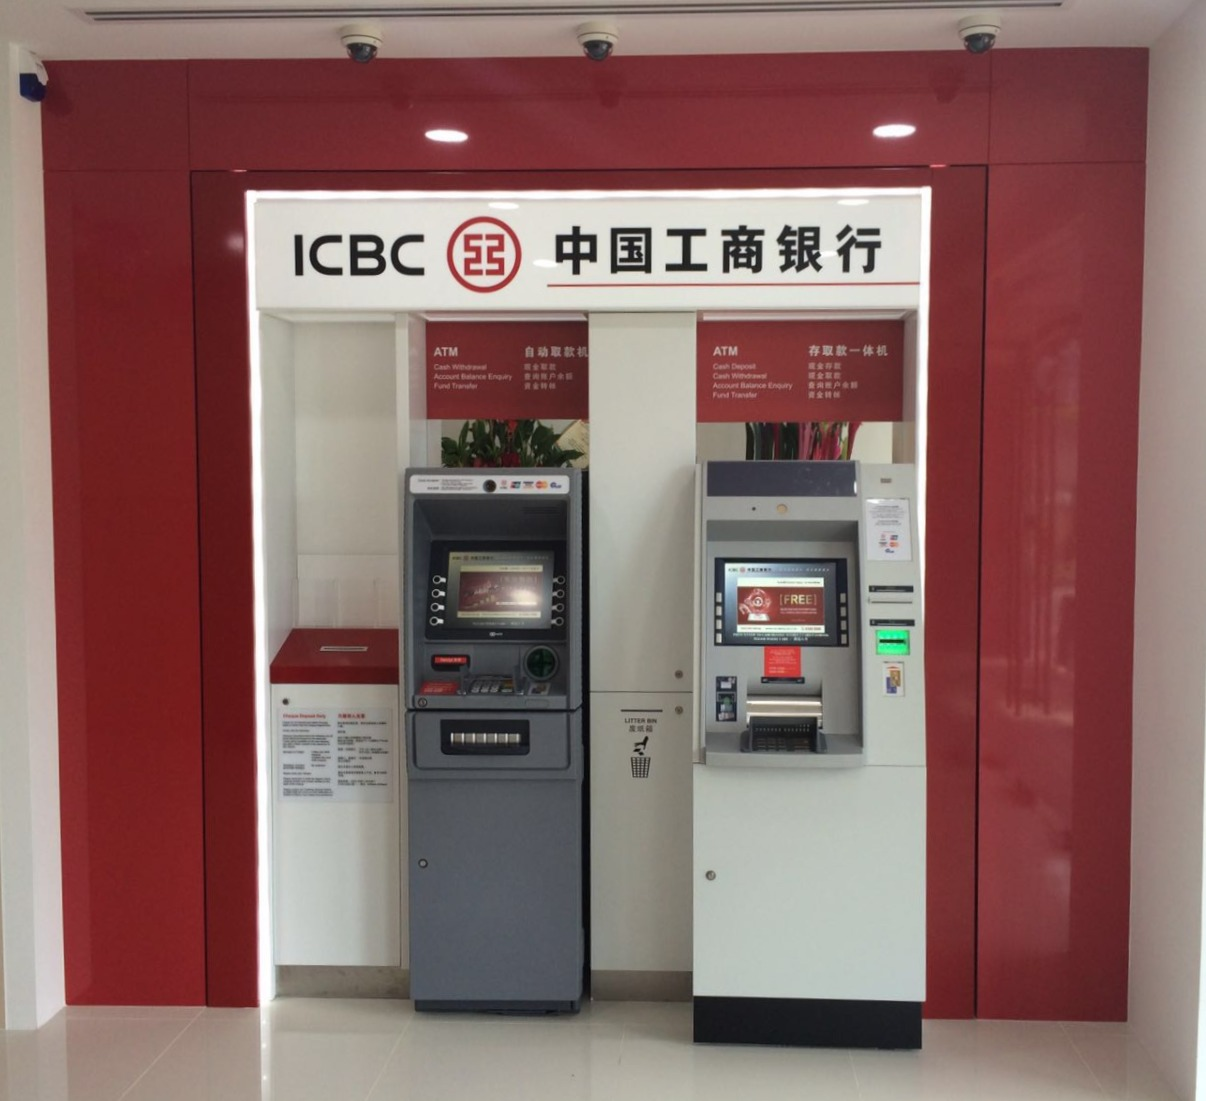 ICBC@Holland V